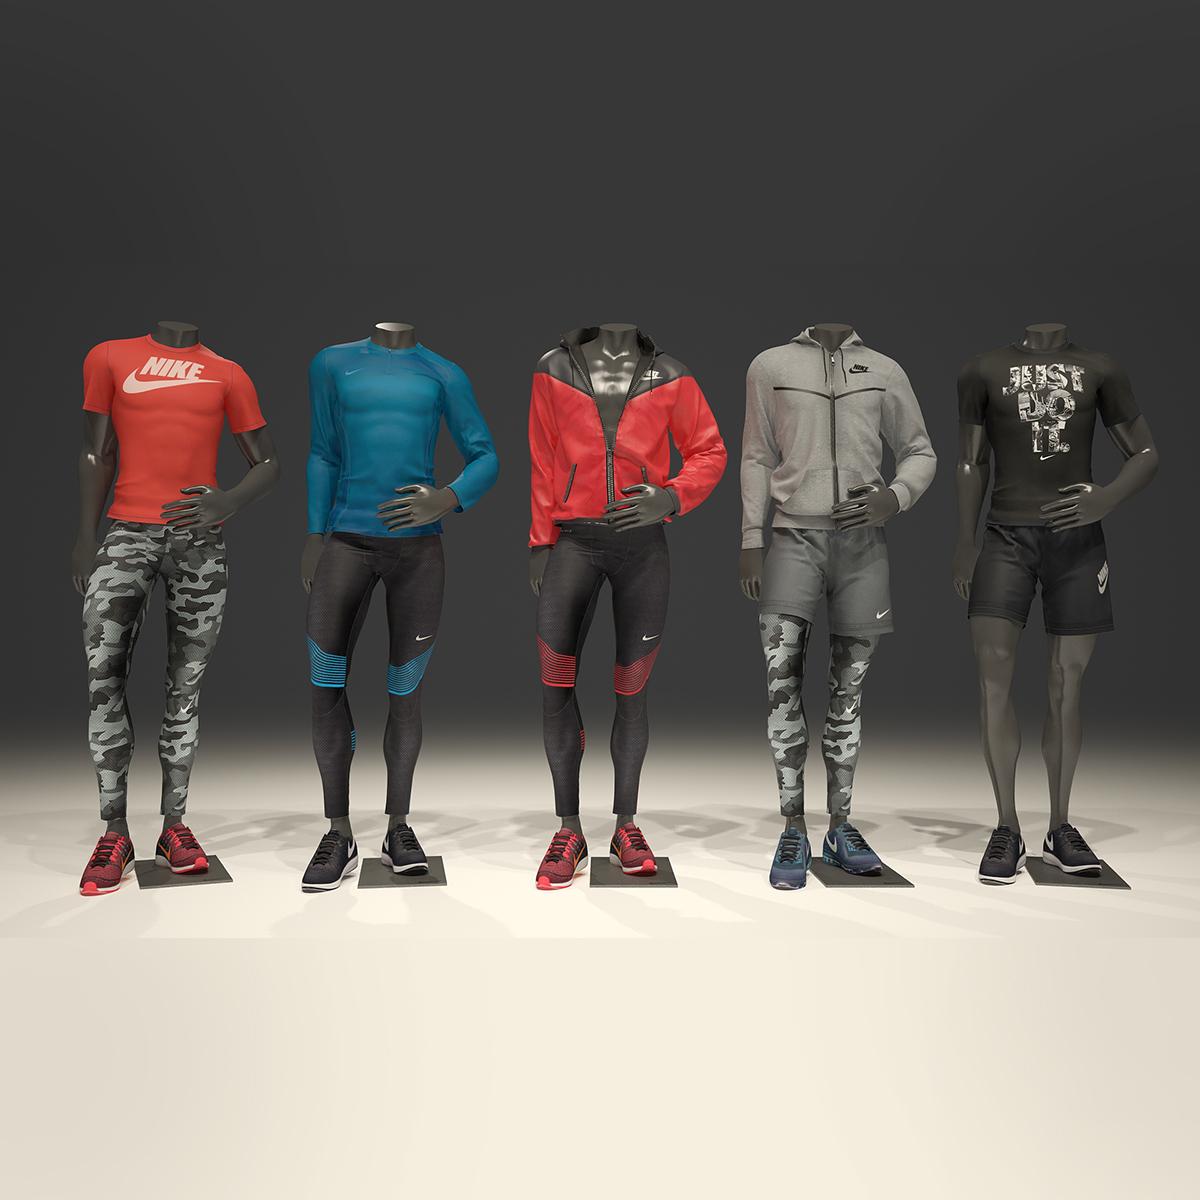 Male Mannequin Nike Pack 1 3d Model By Mrgarret 3docean